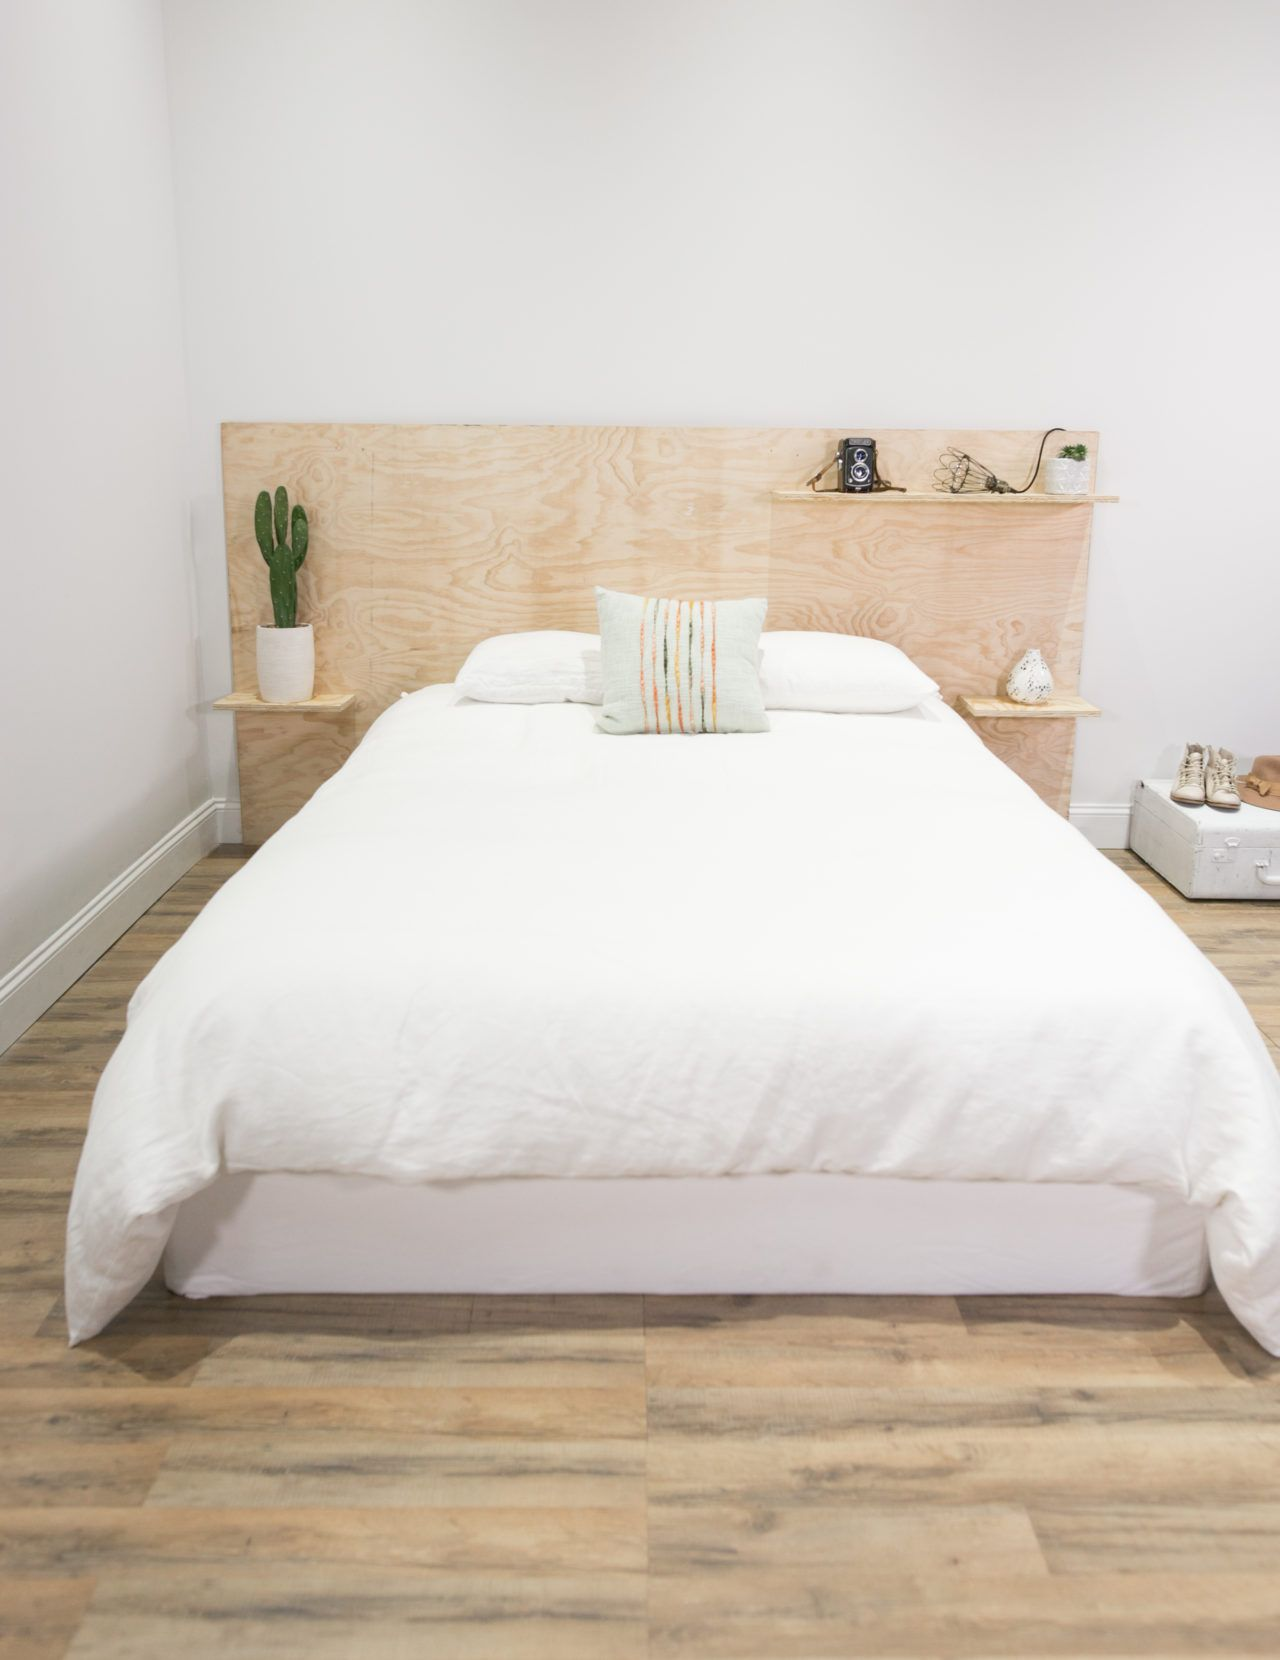 Diy Minimalist Plywood Shelf Headboard Bedroom Design Trends